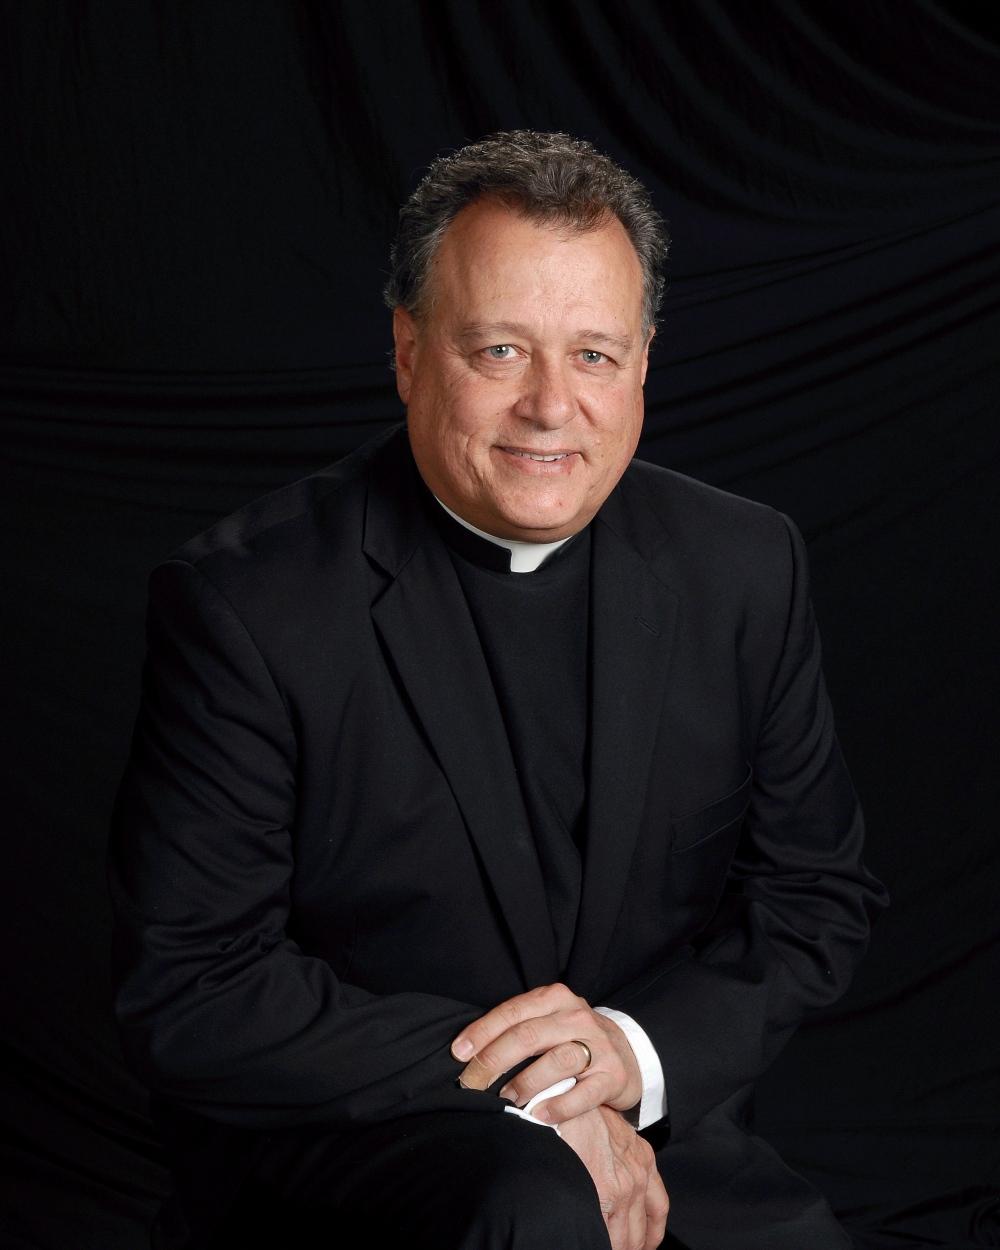 Fr. Andrew - Vicar of the Southwestern Region of the Metropolis of San Francisco